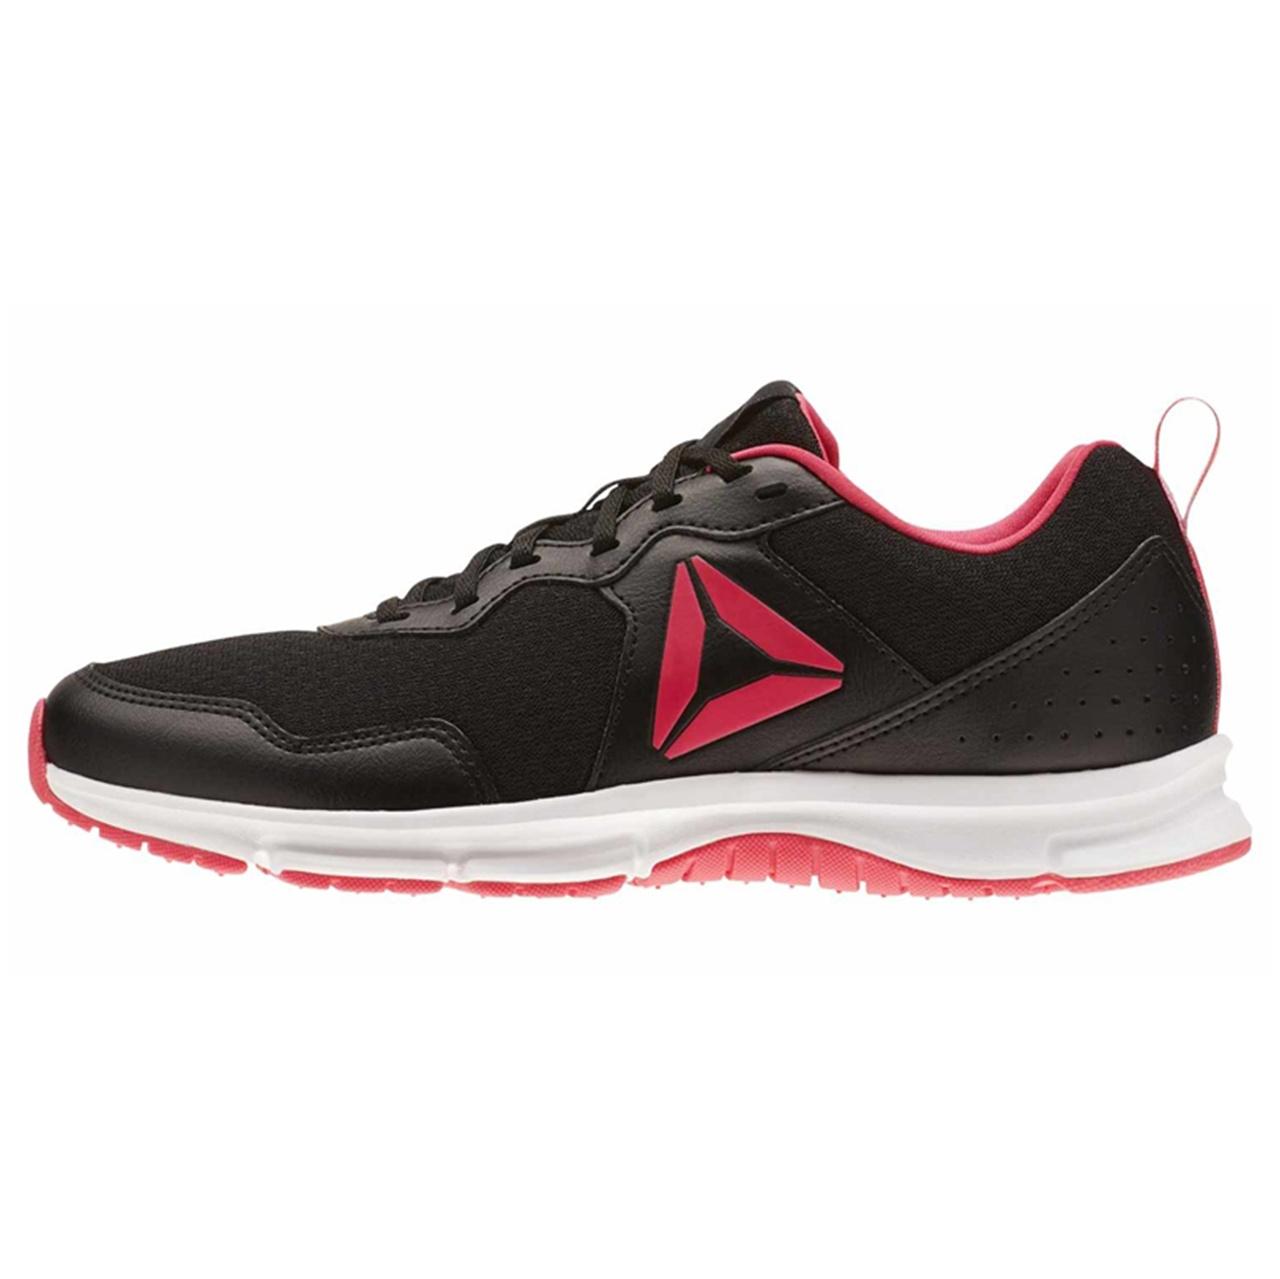 کفش مخصوص دویدن زنانه ریباک مدل EXPRESS RUNNER 2.0 - CN3003